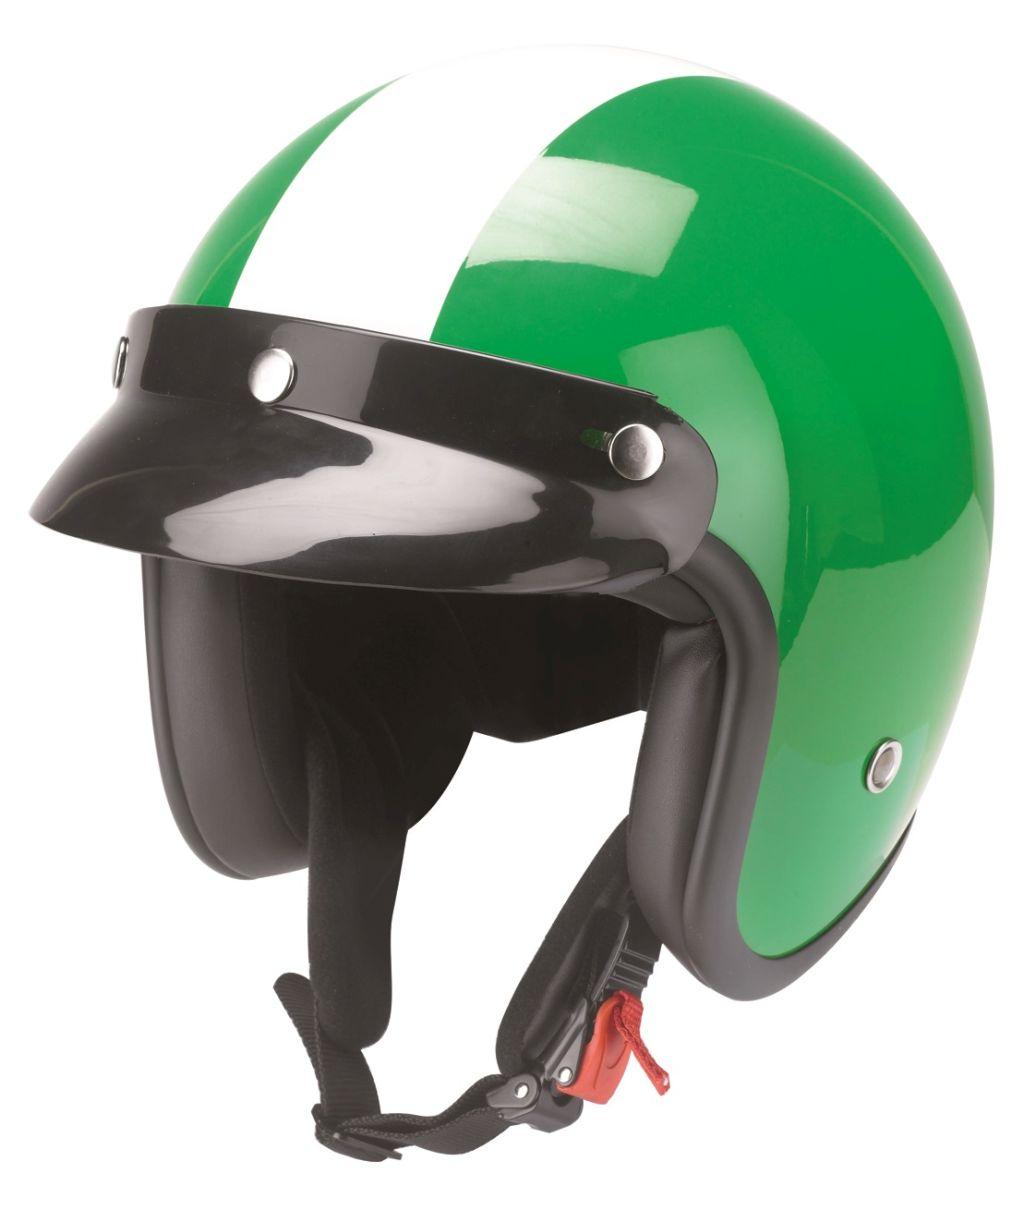 Kochmann Redbike Motorrad Jet Helm weiss grün mit ECE RB 753 Oldtimer XS - XXL